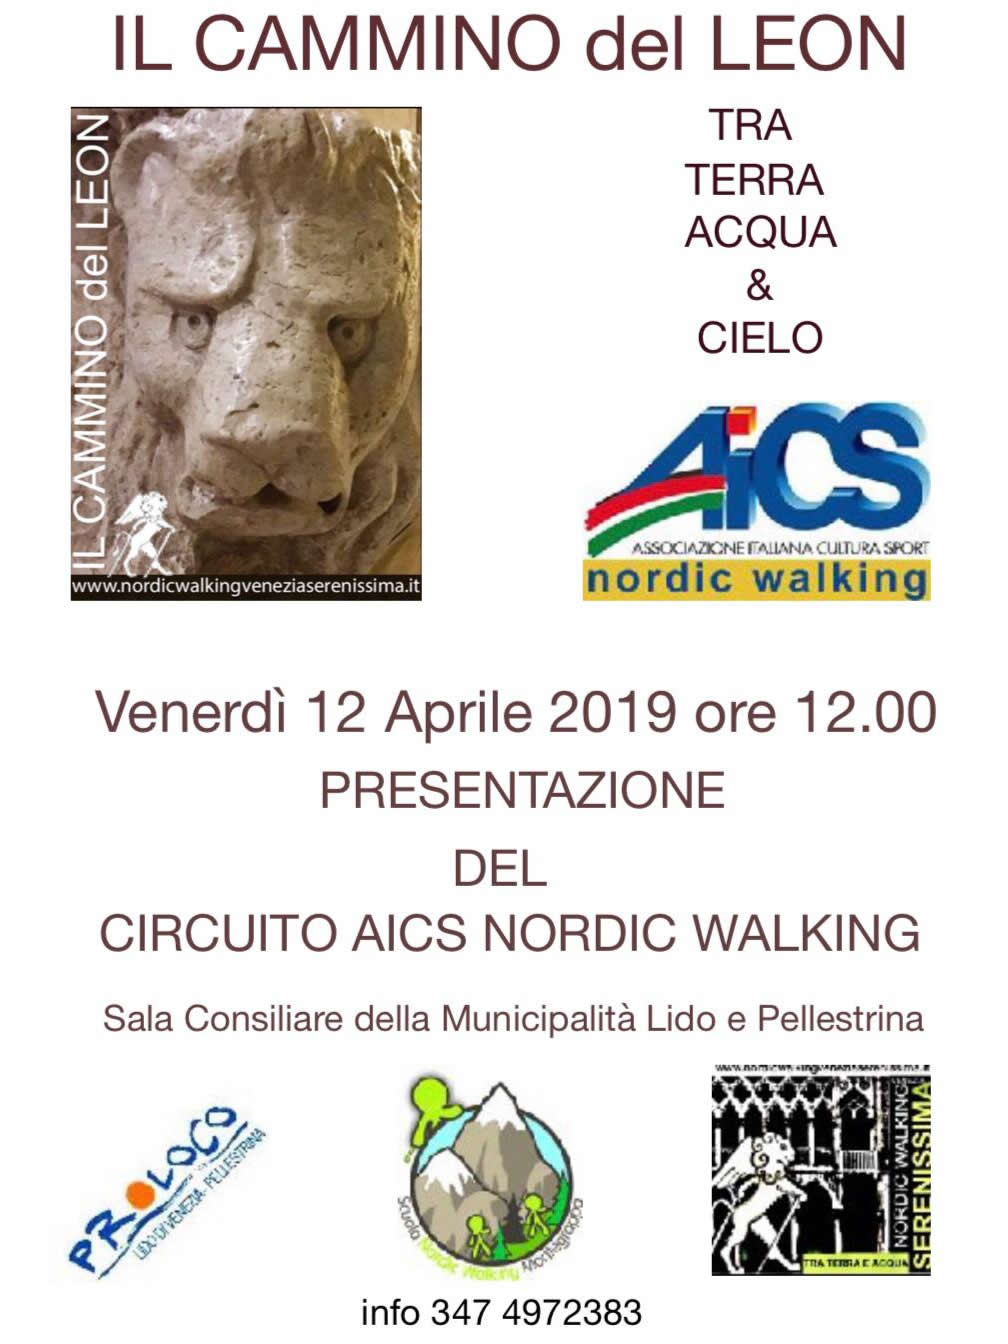 Nordic Walking Vicenza Calendario.Scuola Nordic Walking Montegrappa Articoli In Evidenza